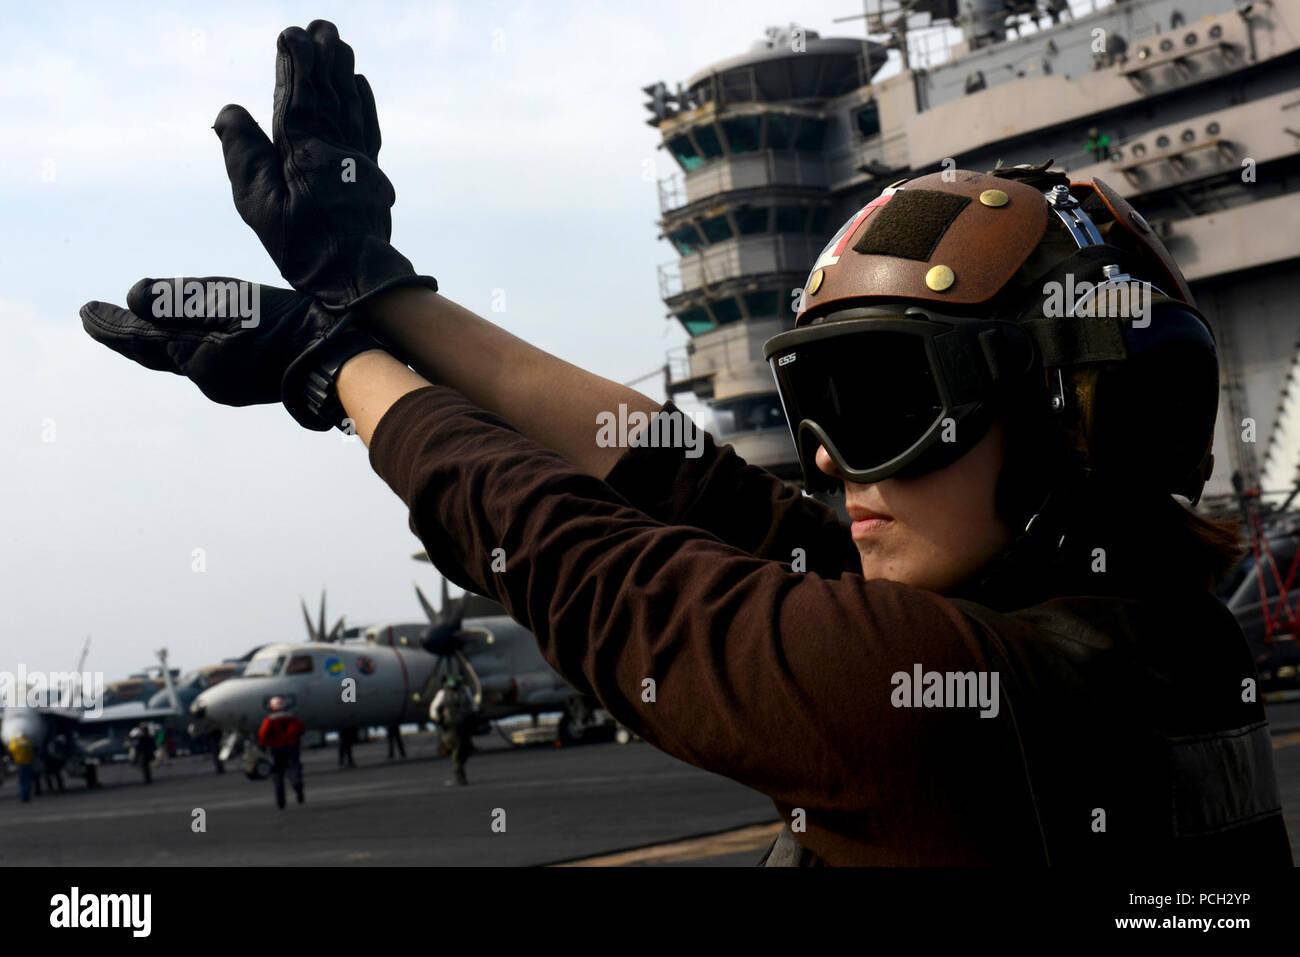 King Carrier Stockfotos & King Carrier Bilder - Alamy